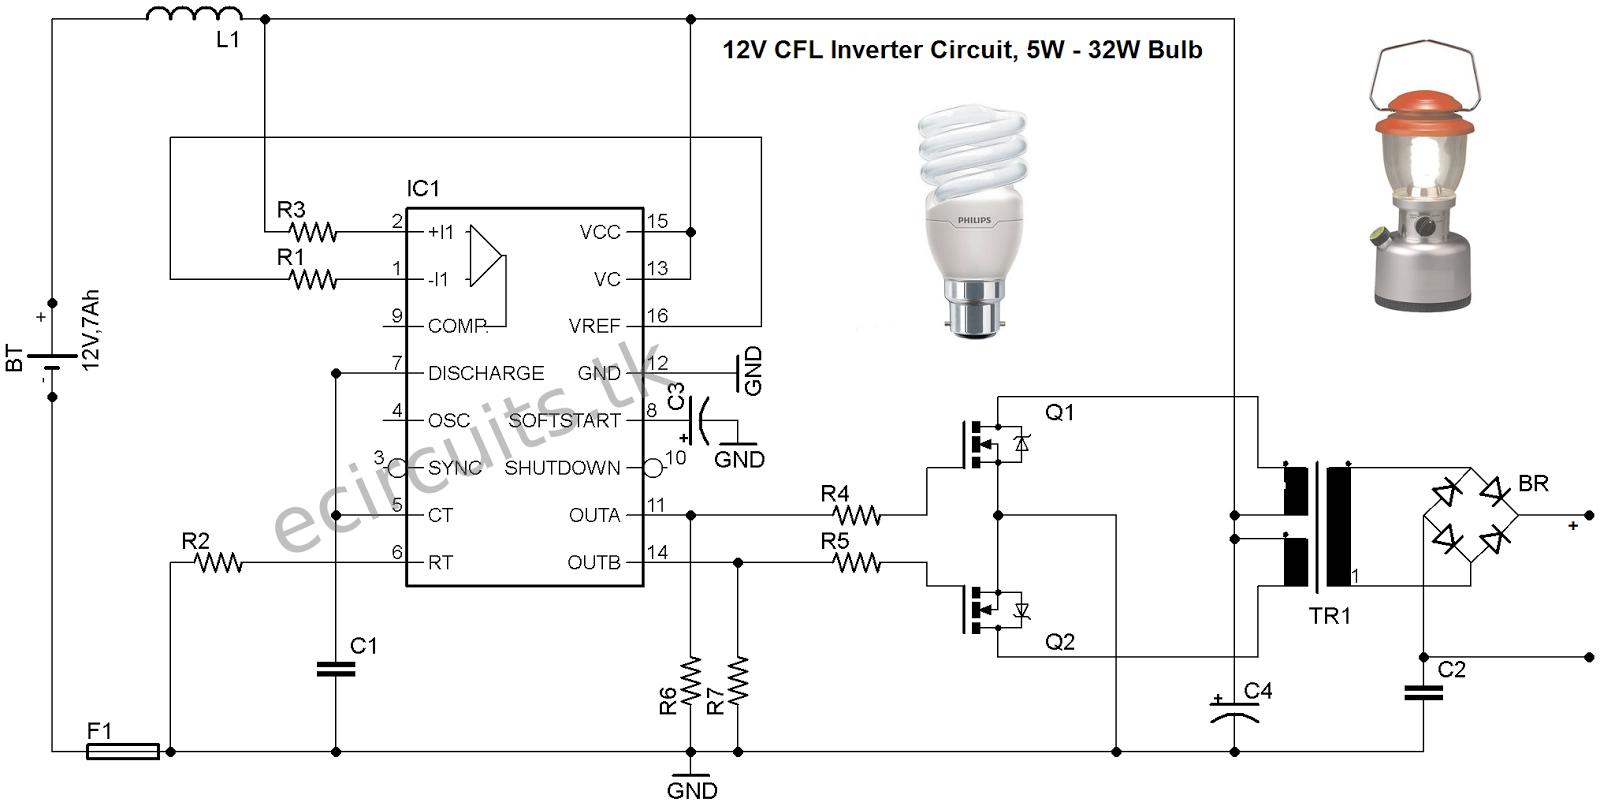 lighting schematics circuit skemarangkaian com emergency led emergency light circuit diagram cfl ballast circuit diagram led [ 1600 x 806 Pixel ]